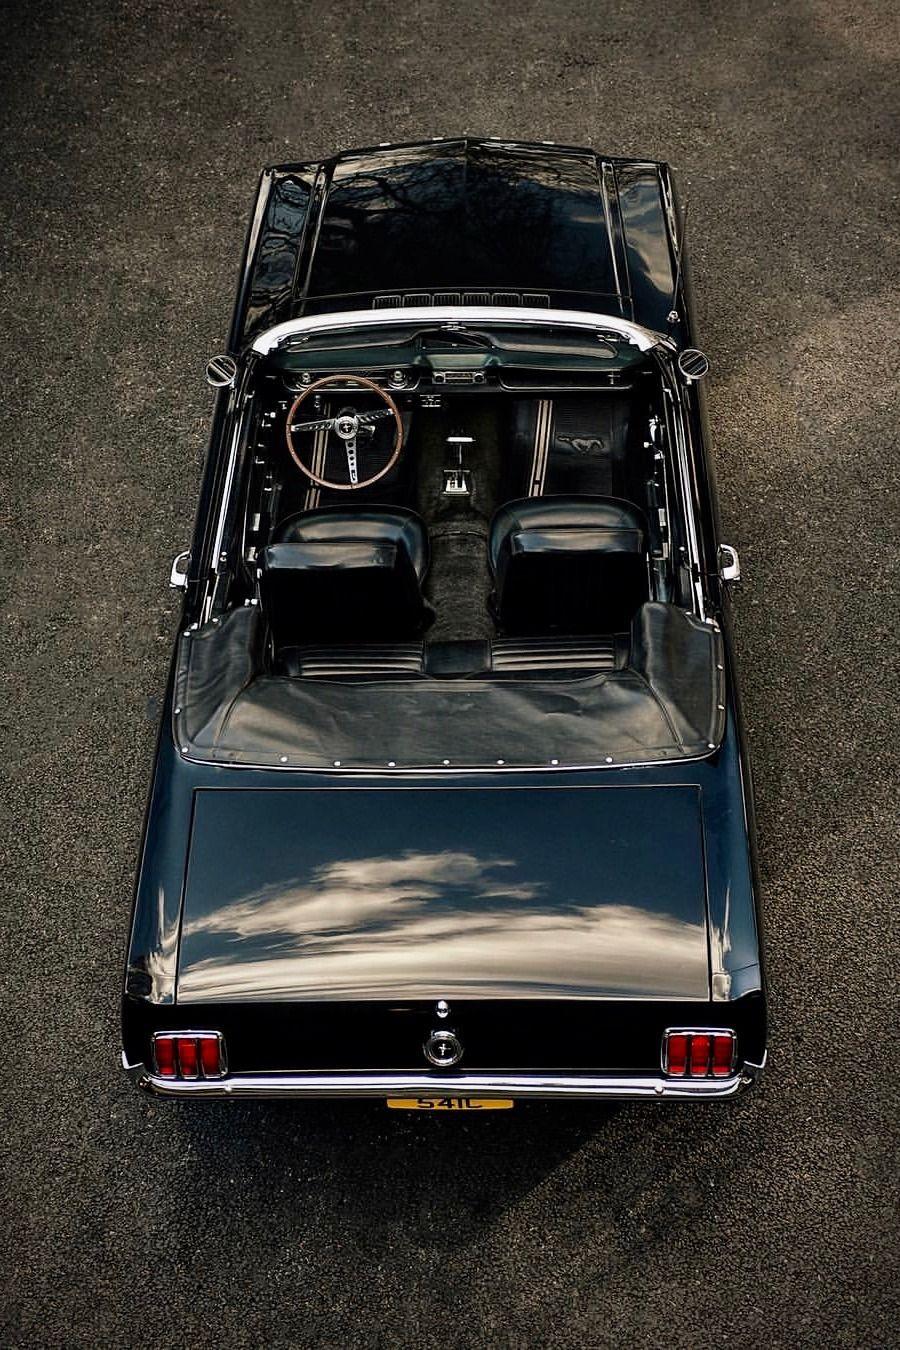 Mustang Pony Car Convertible Vintage Cars Clic Auto